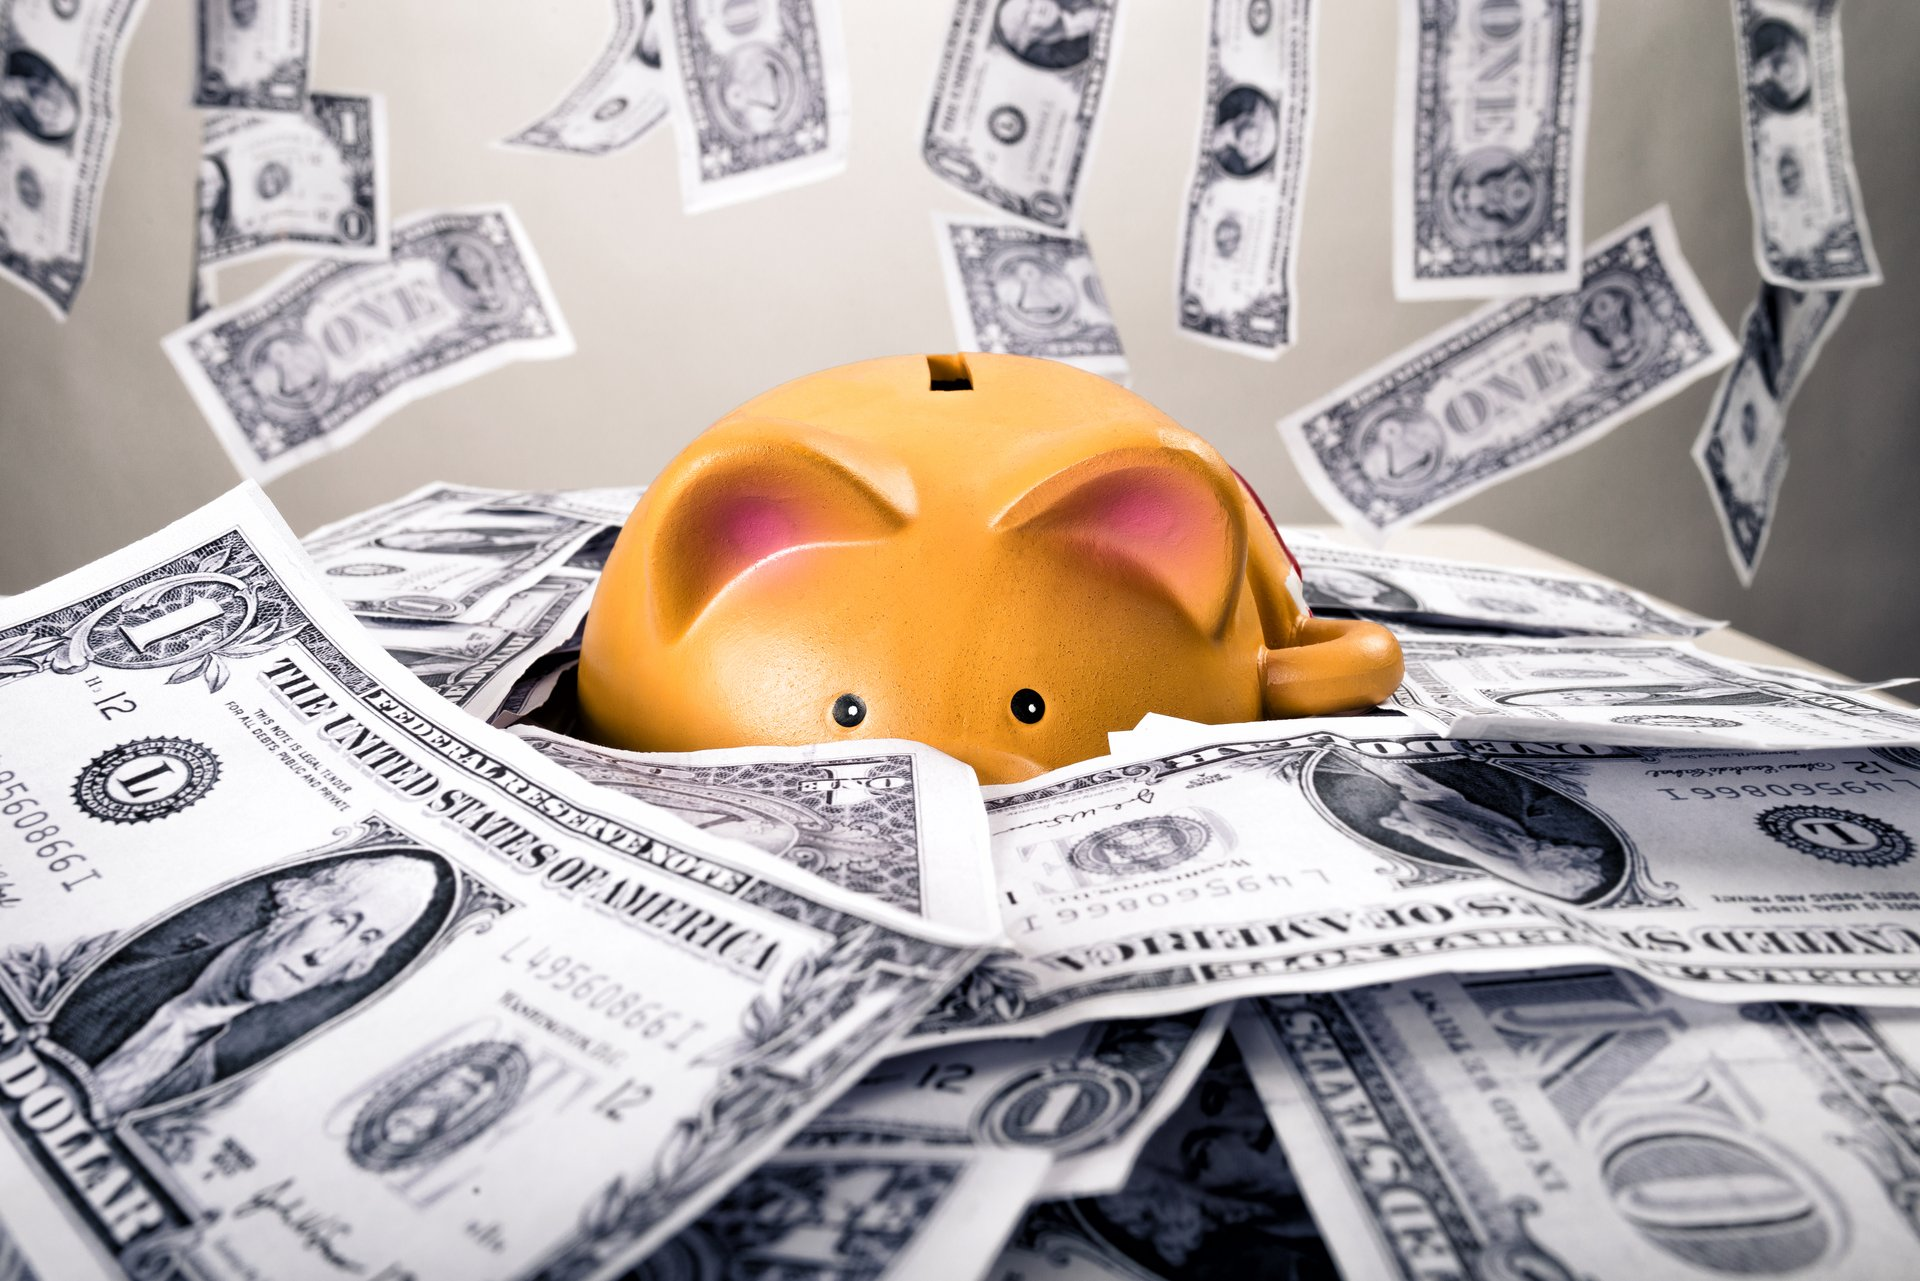 Money piles up around a piggy bank